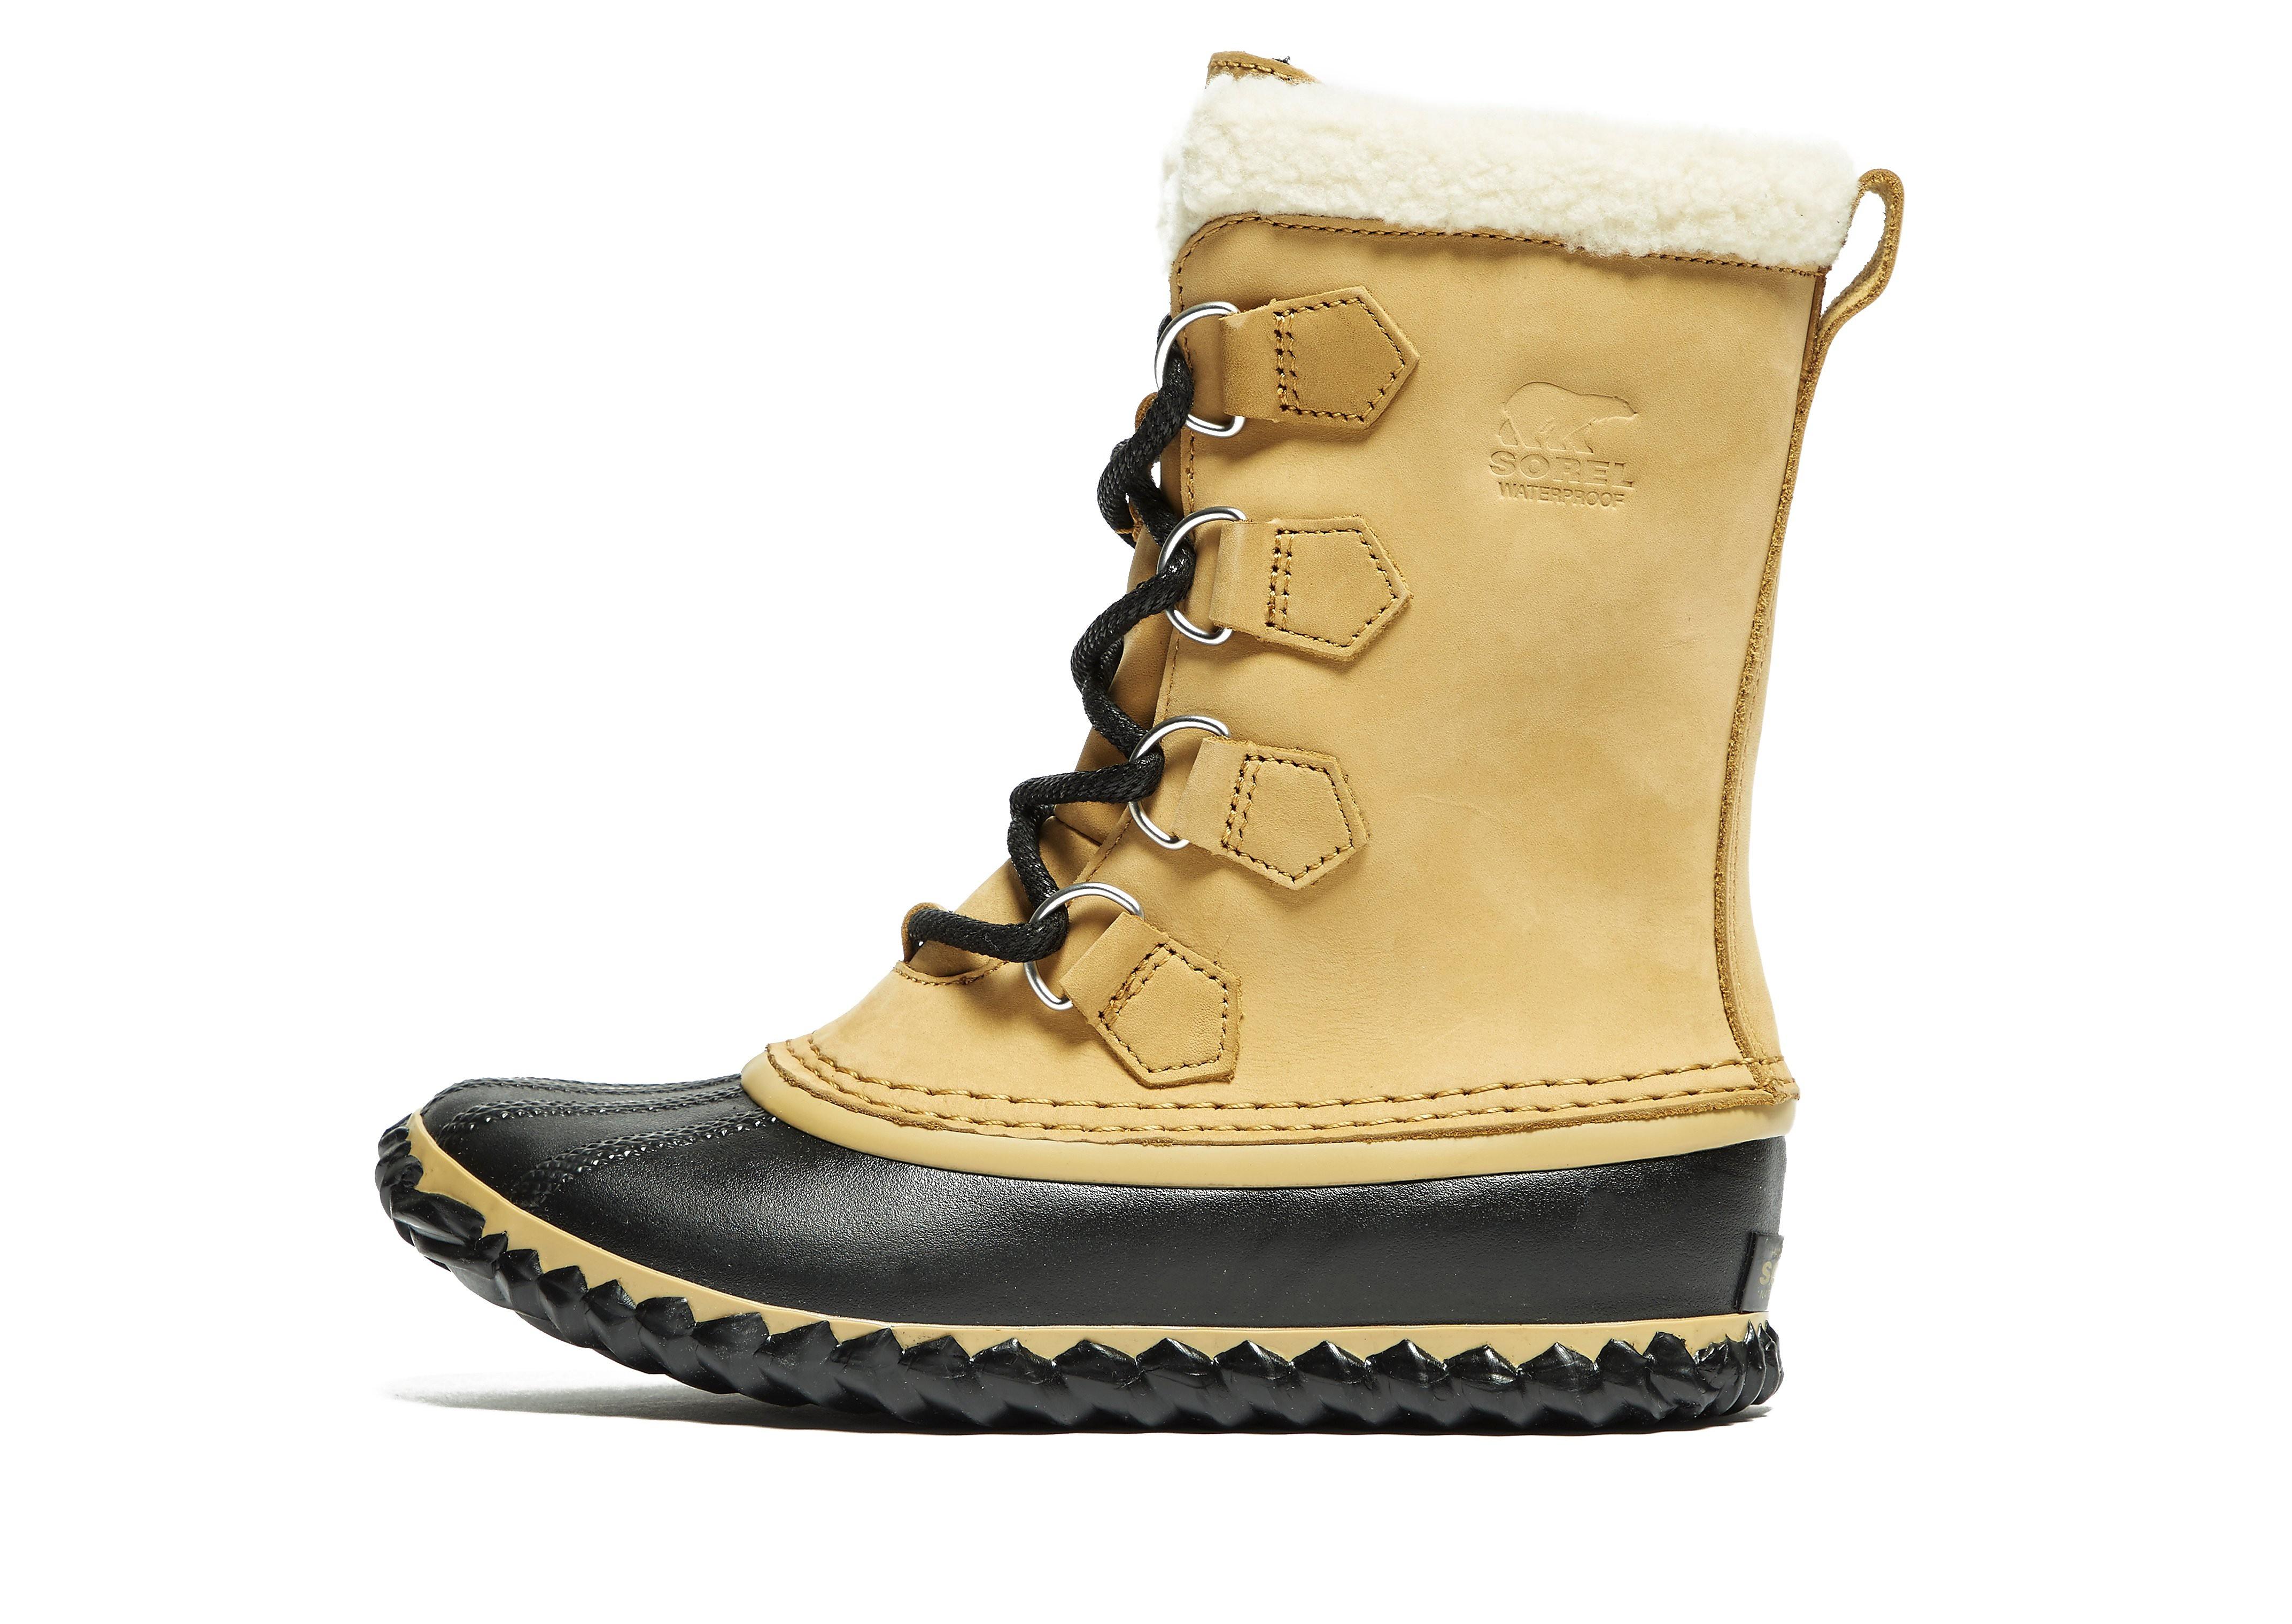 Sorel Caribou Slim Women's Winter Snow Boots